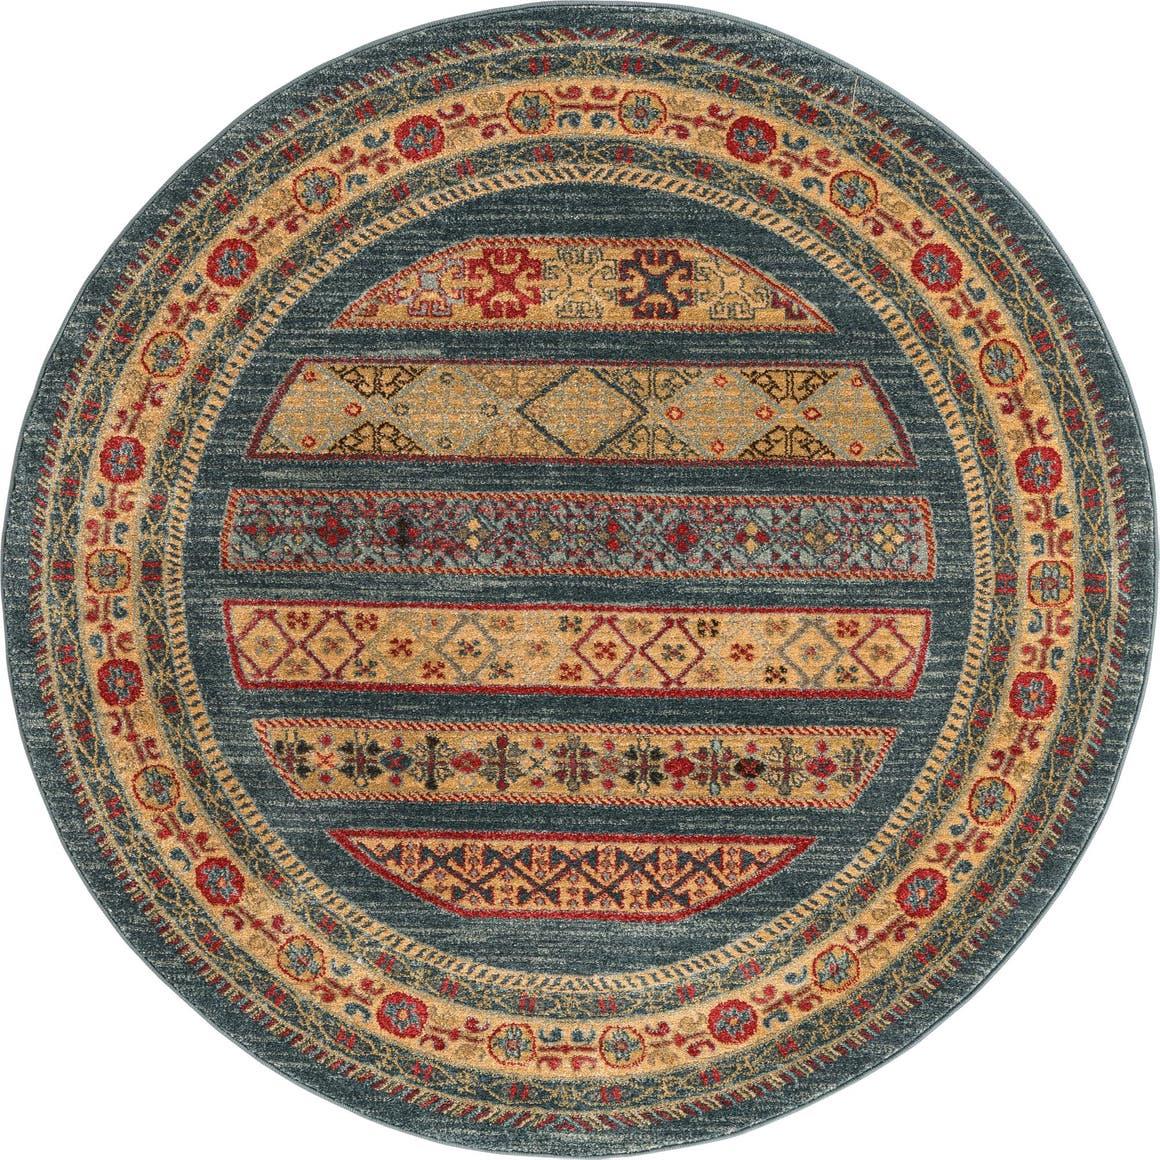 5' x 5' Kashkuli Gabbeh Round Rug main image